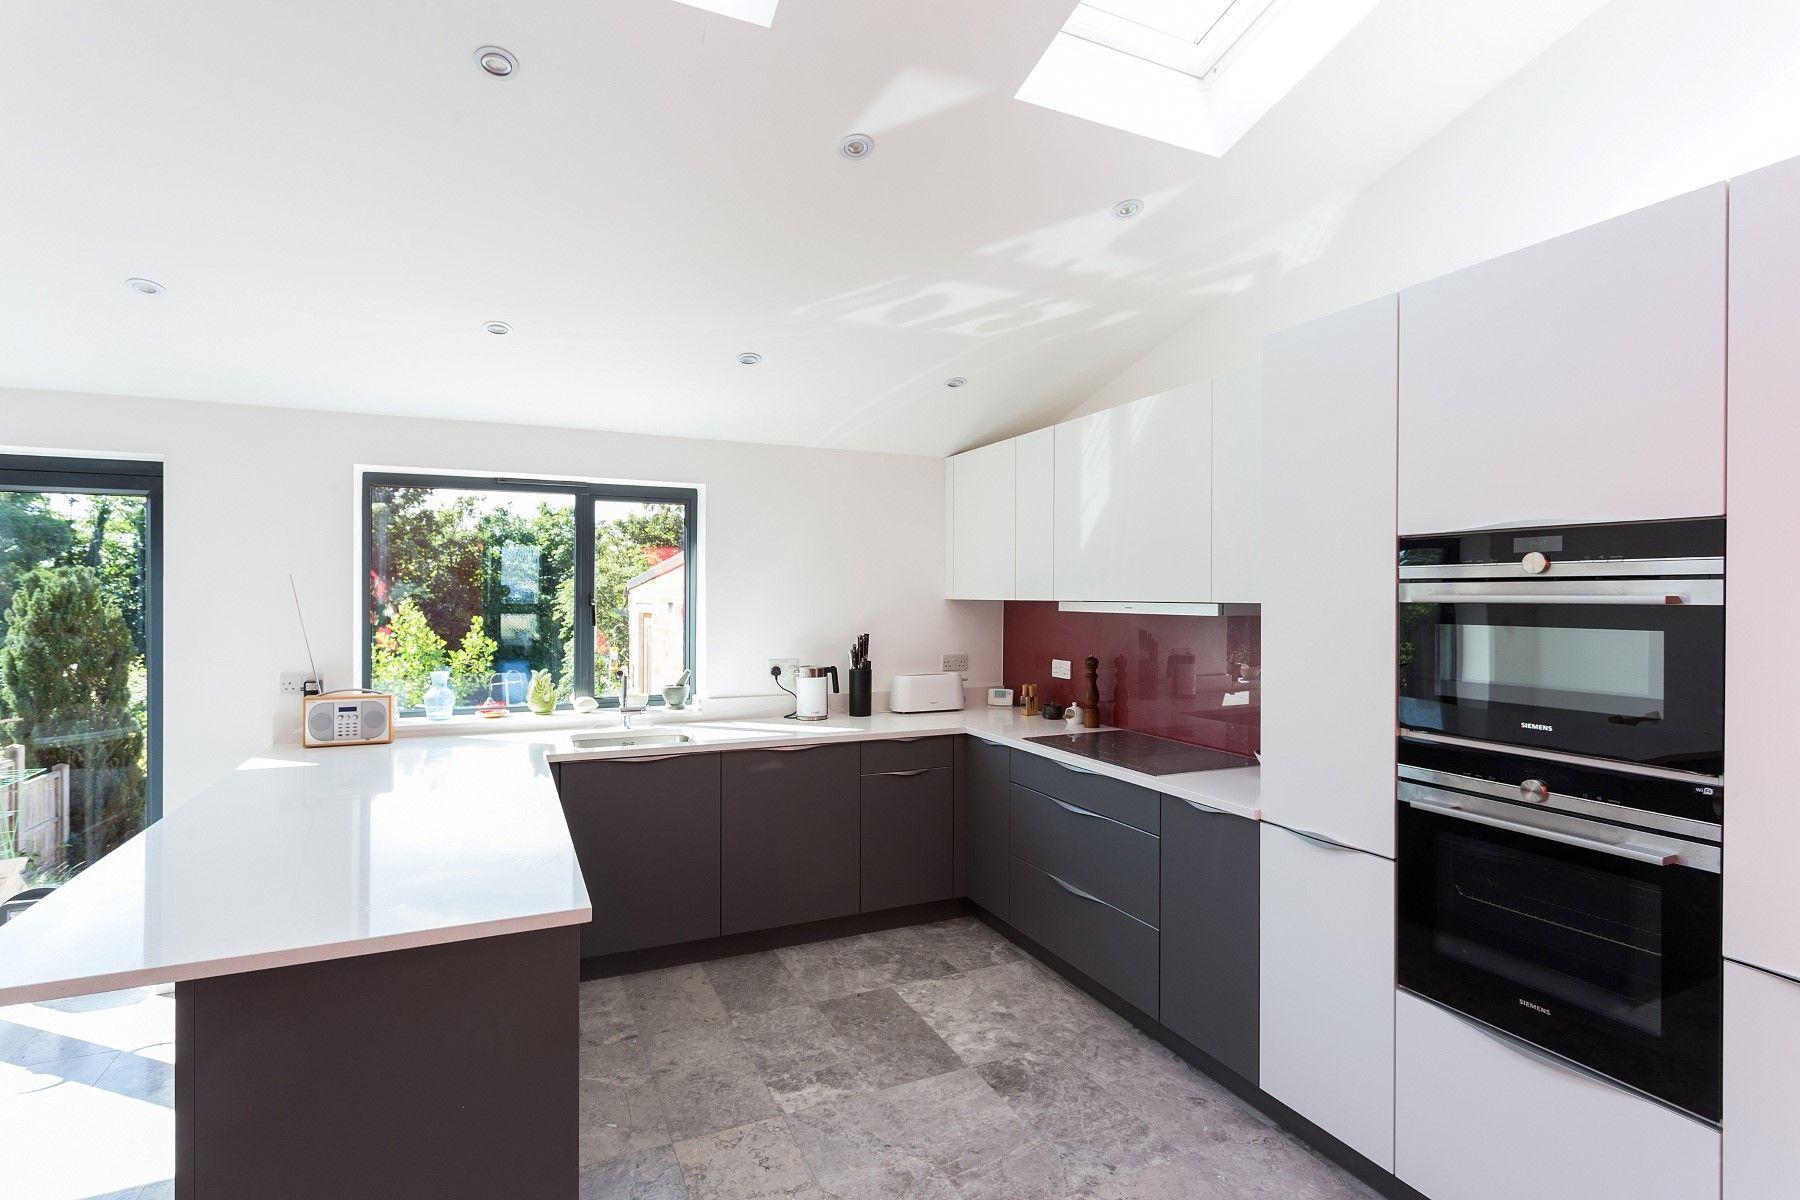 Matt Quartz Grey and White Nolte Kitchen with top mounted handles ...